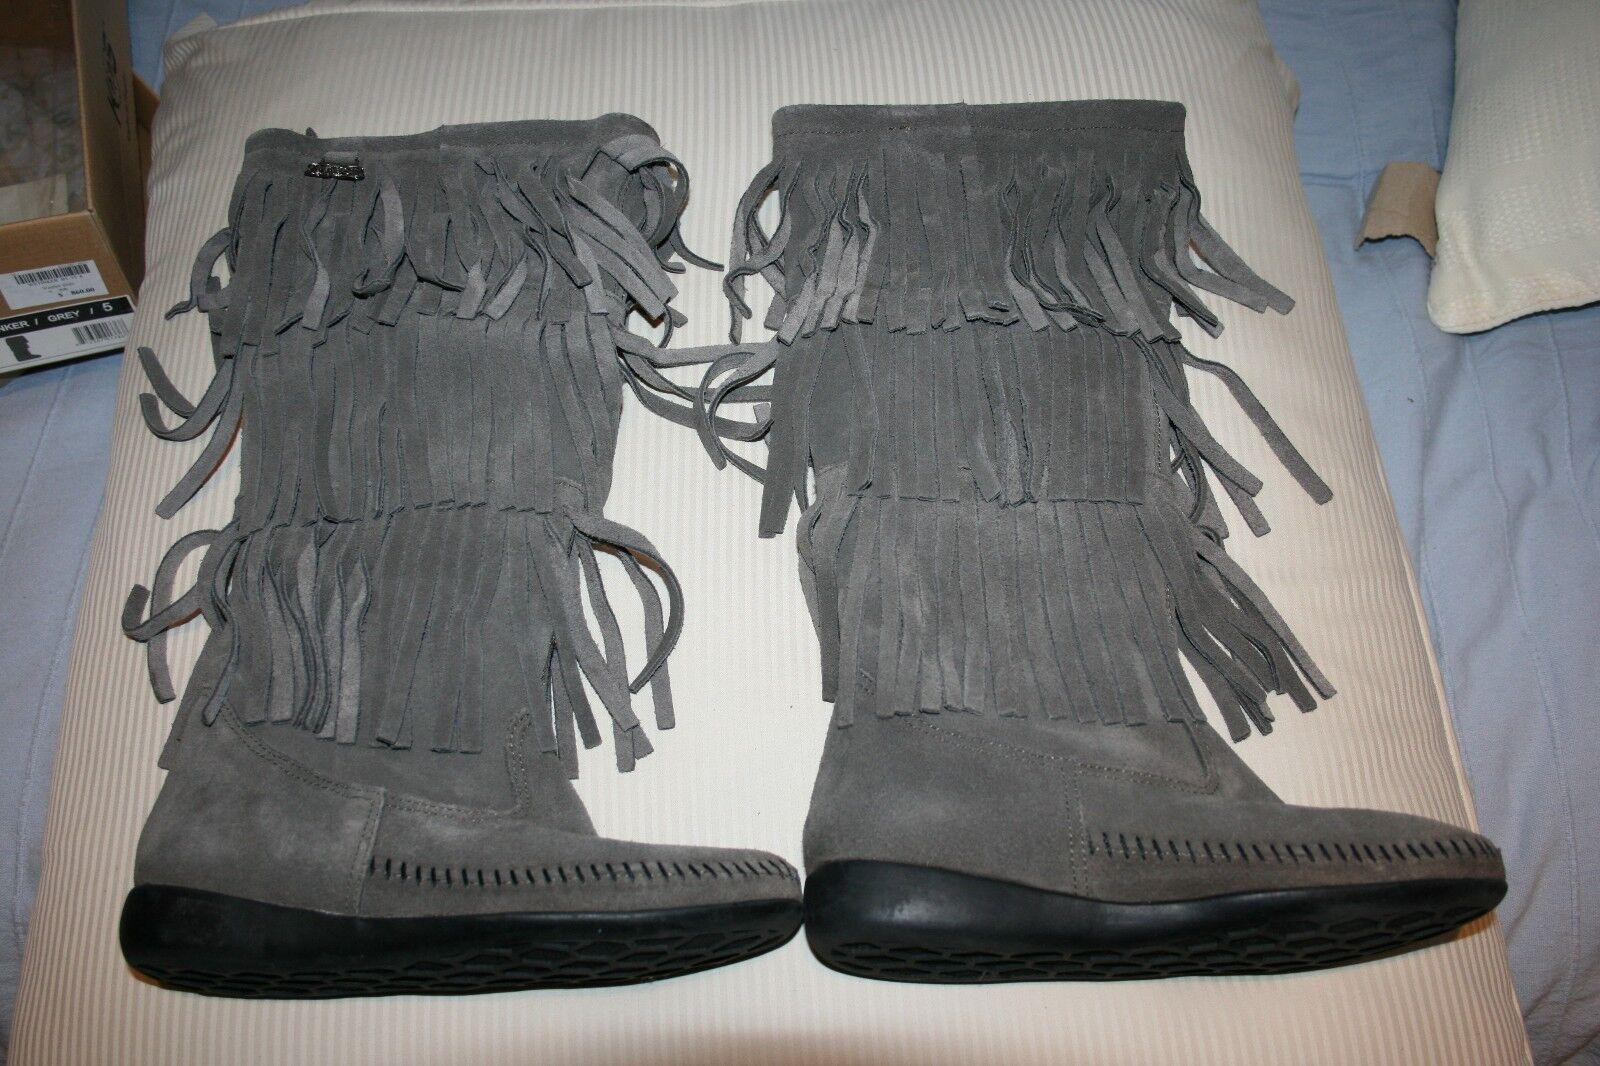 KOs nos Tinker Gamuza Cuero gris botas en Caja Damas Tassle flecos  UK Talla 3